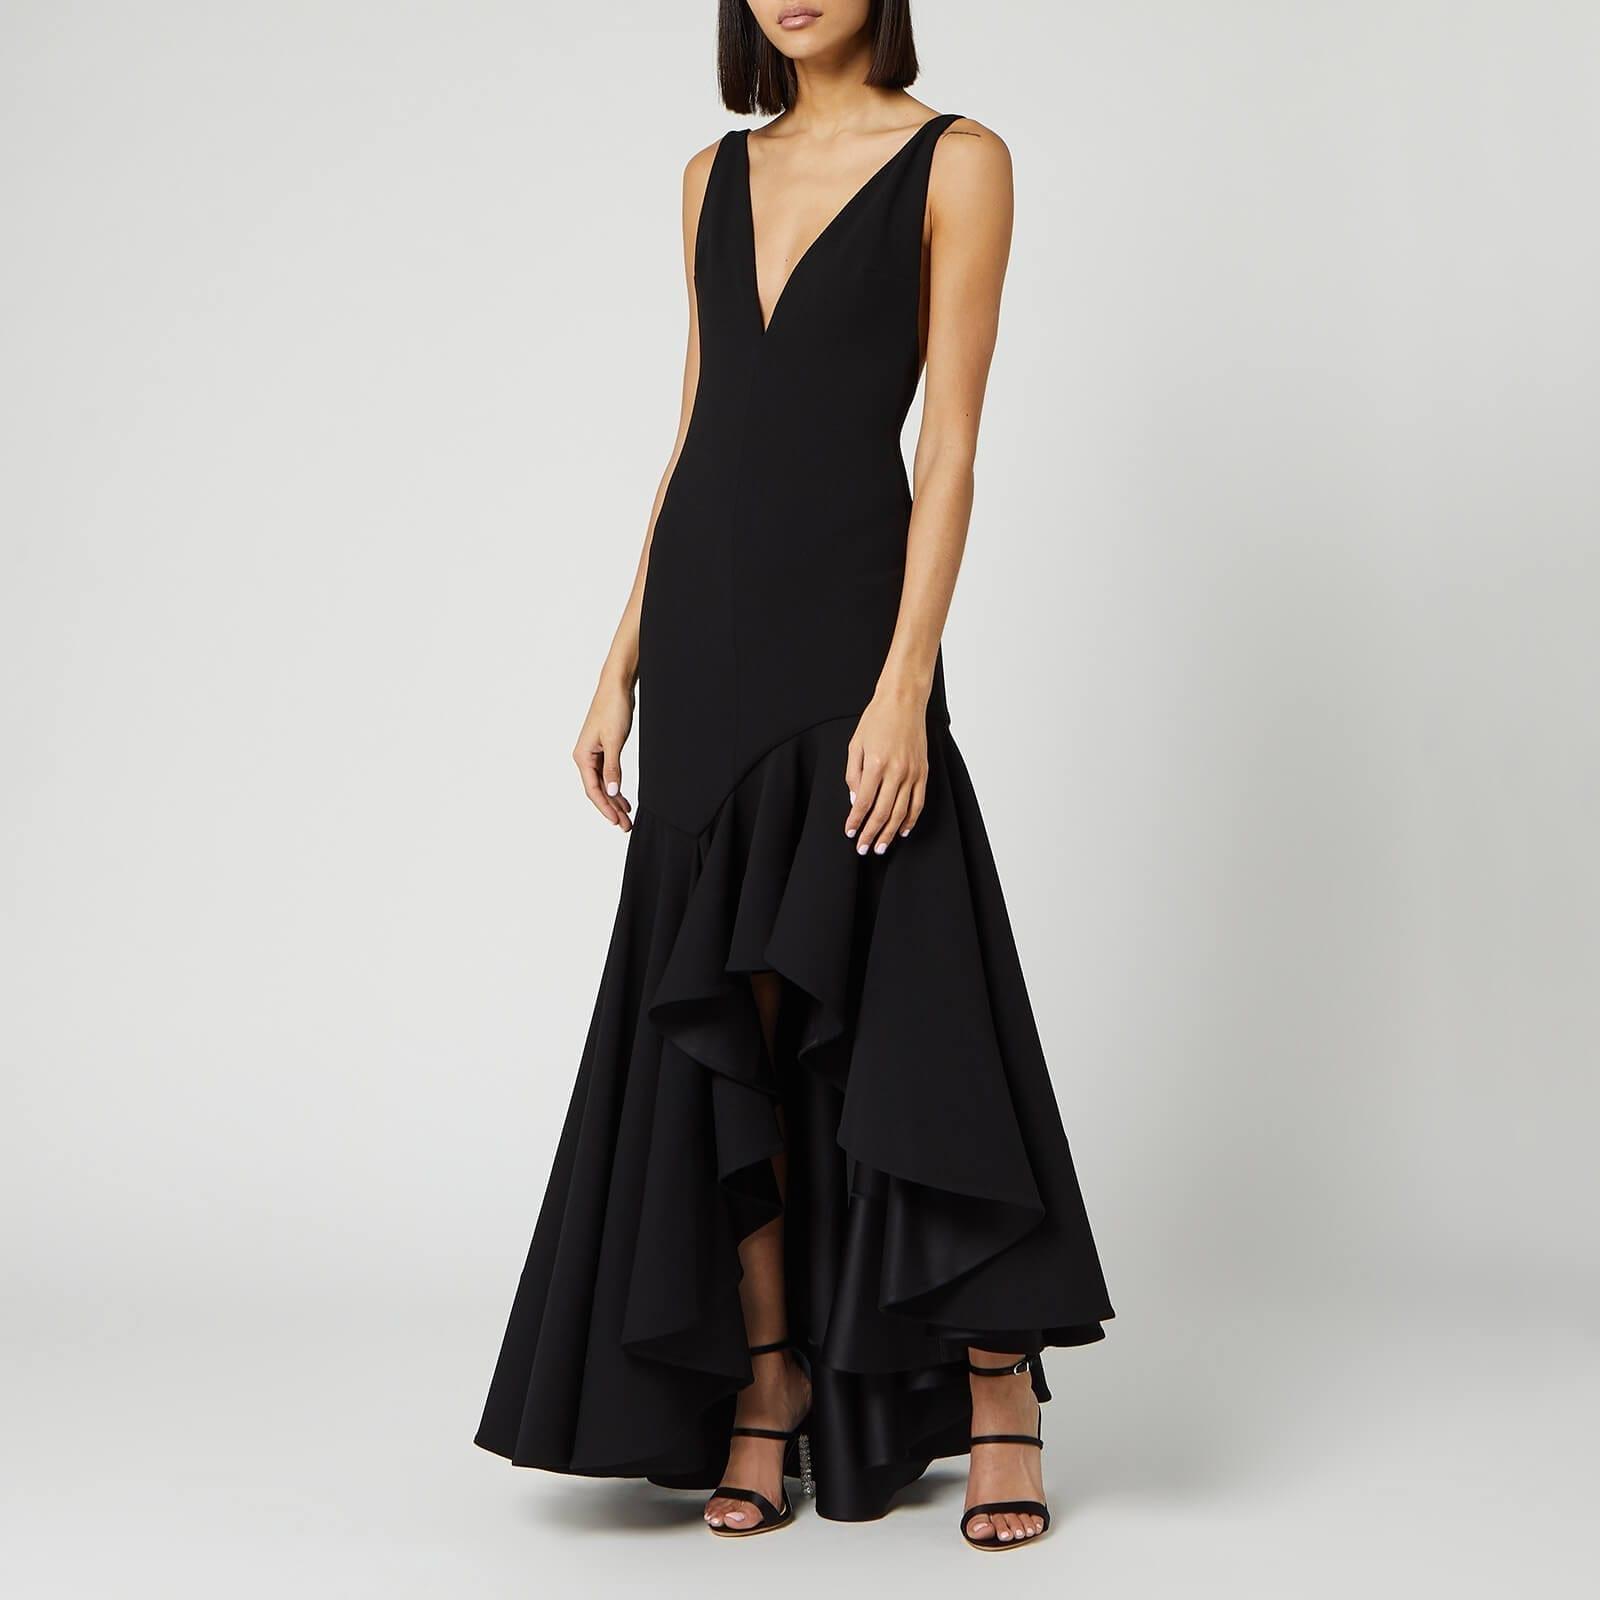 SOLACE LONDON Women's Edana Midaxi Dress